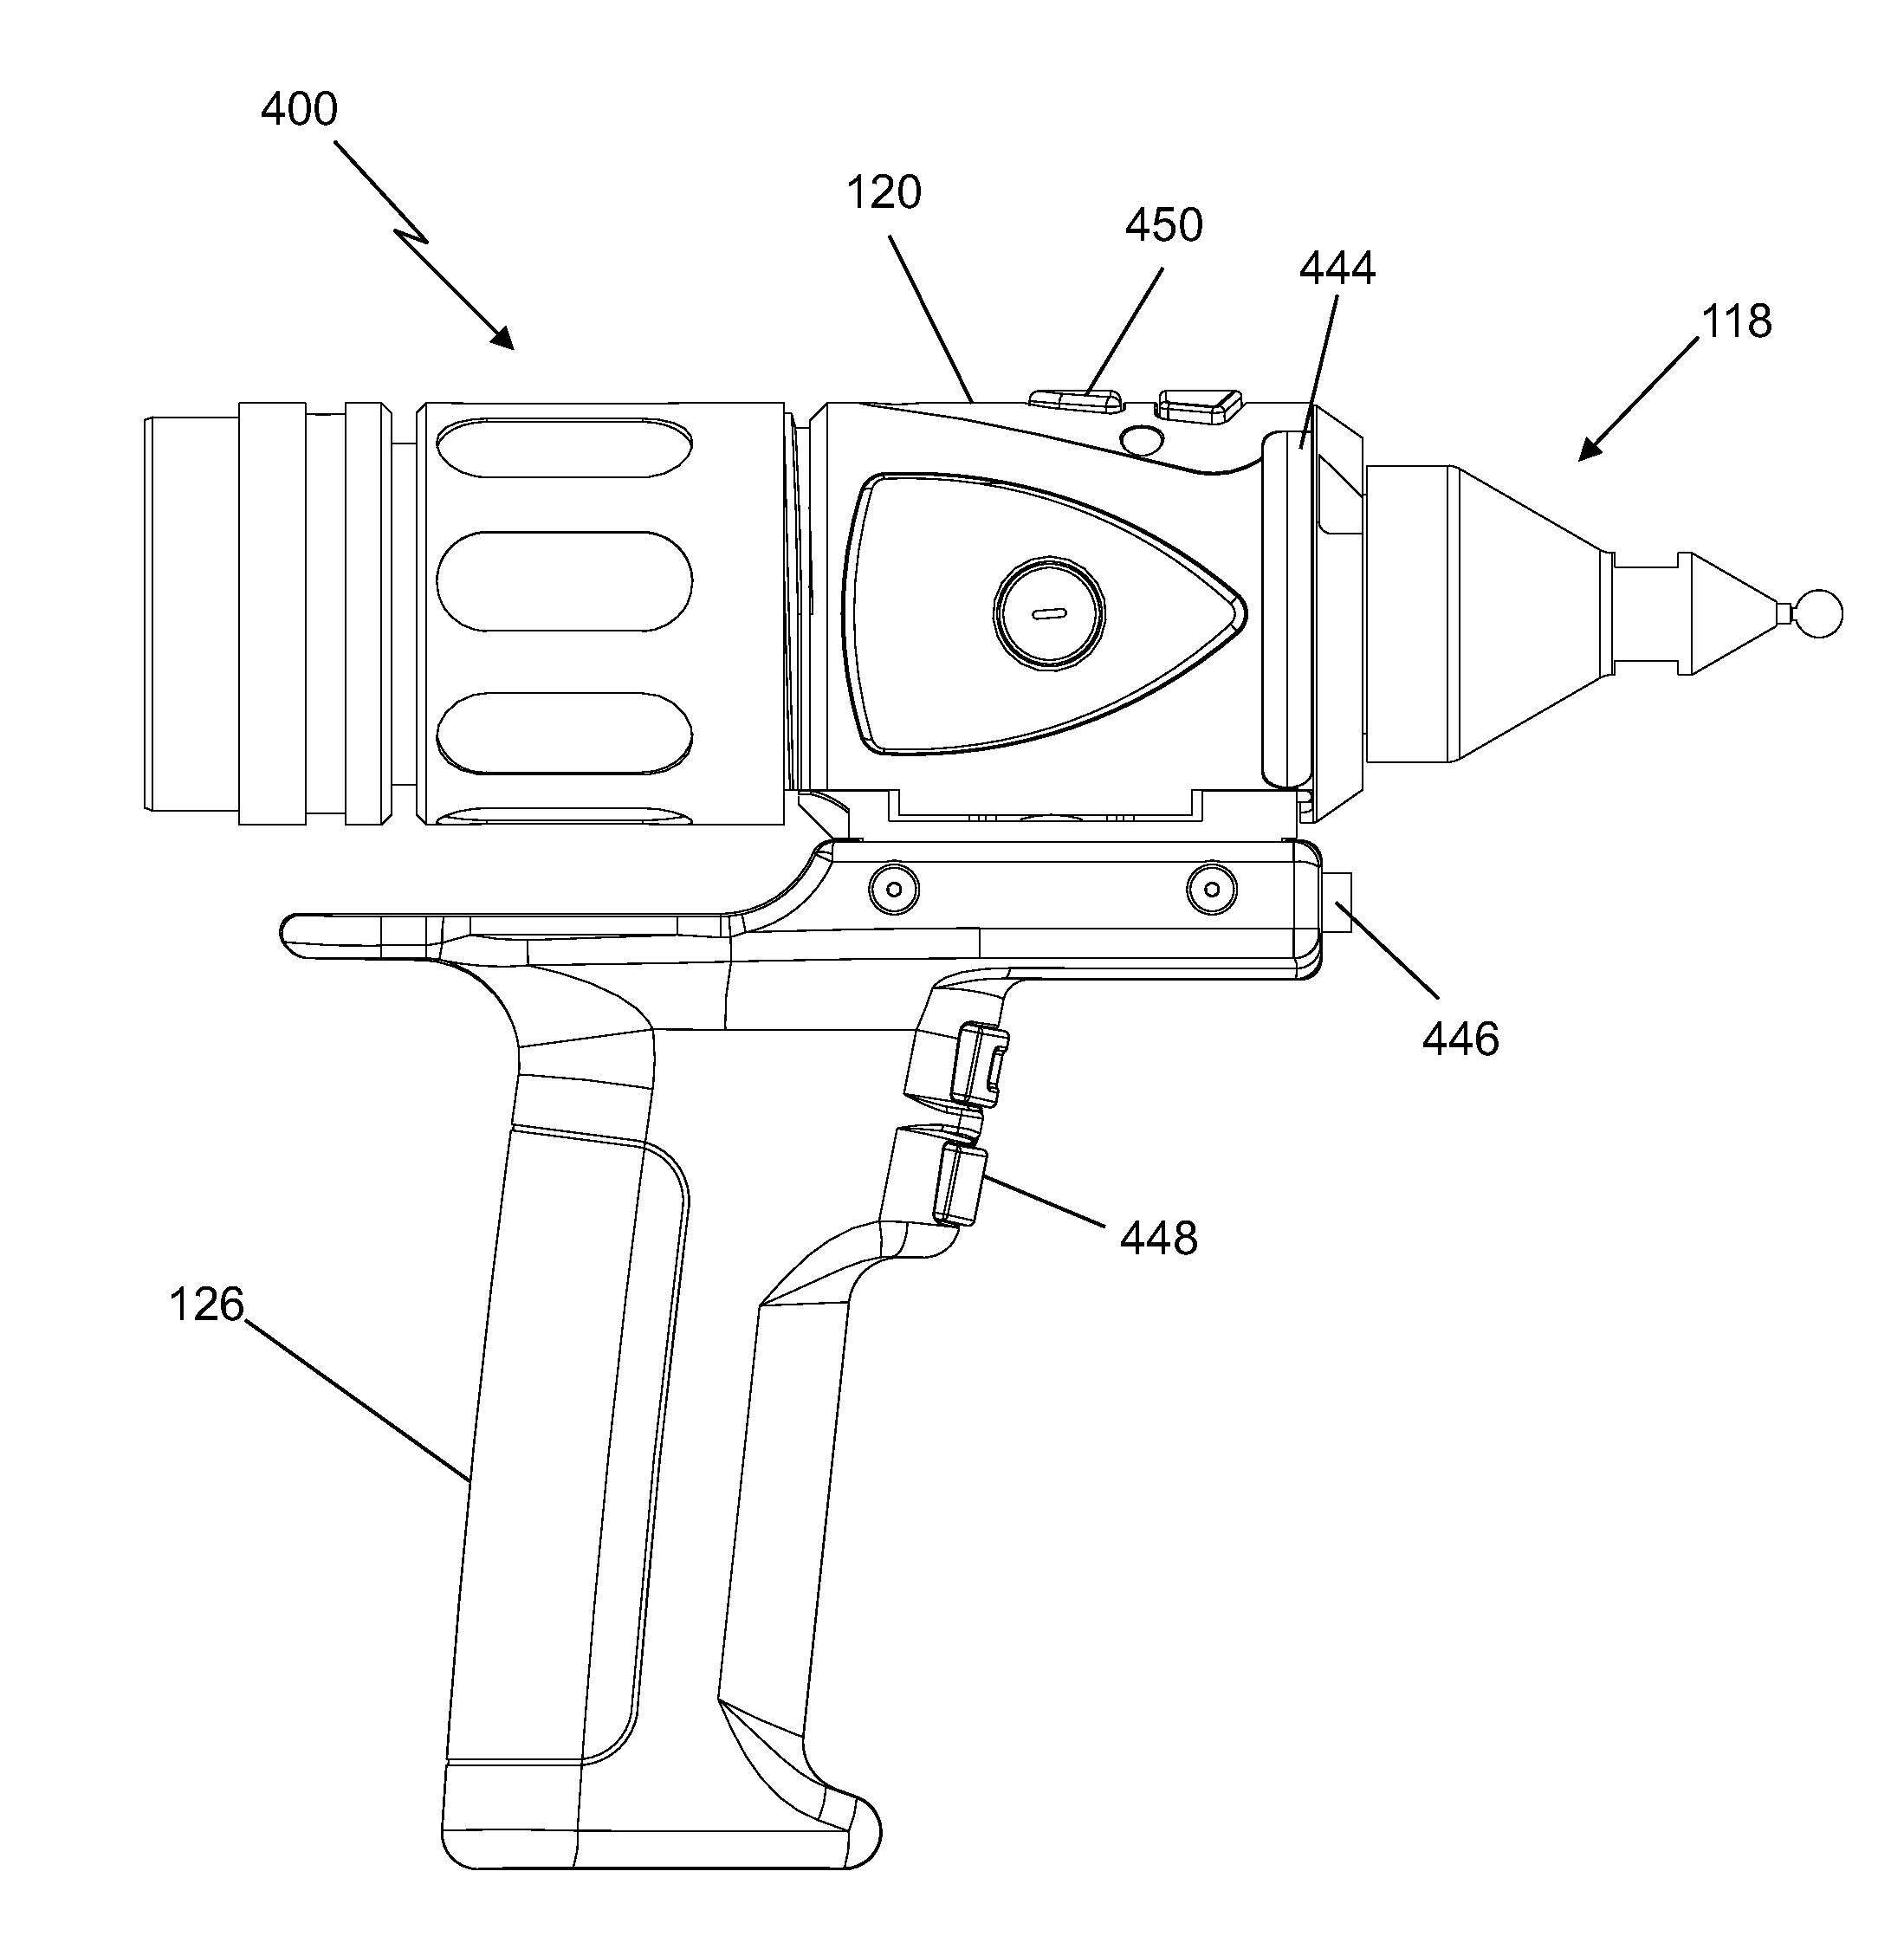 Patente Us8537374 Coordinate Measuring Machine Having An Briggs And Stratton 65 Hp Engine Diagram Mia Blog Patent Drawing